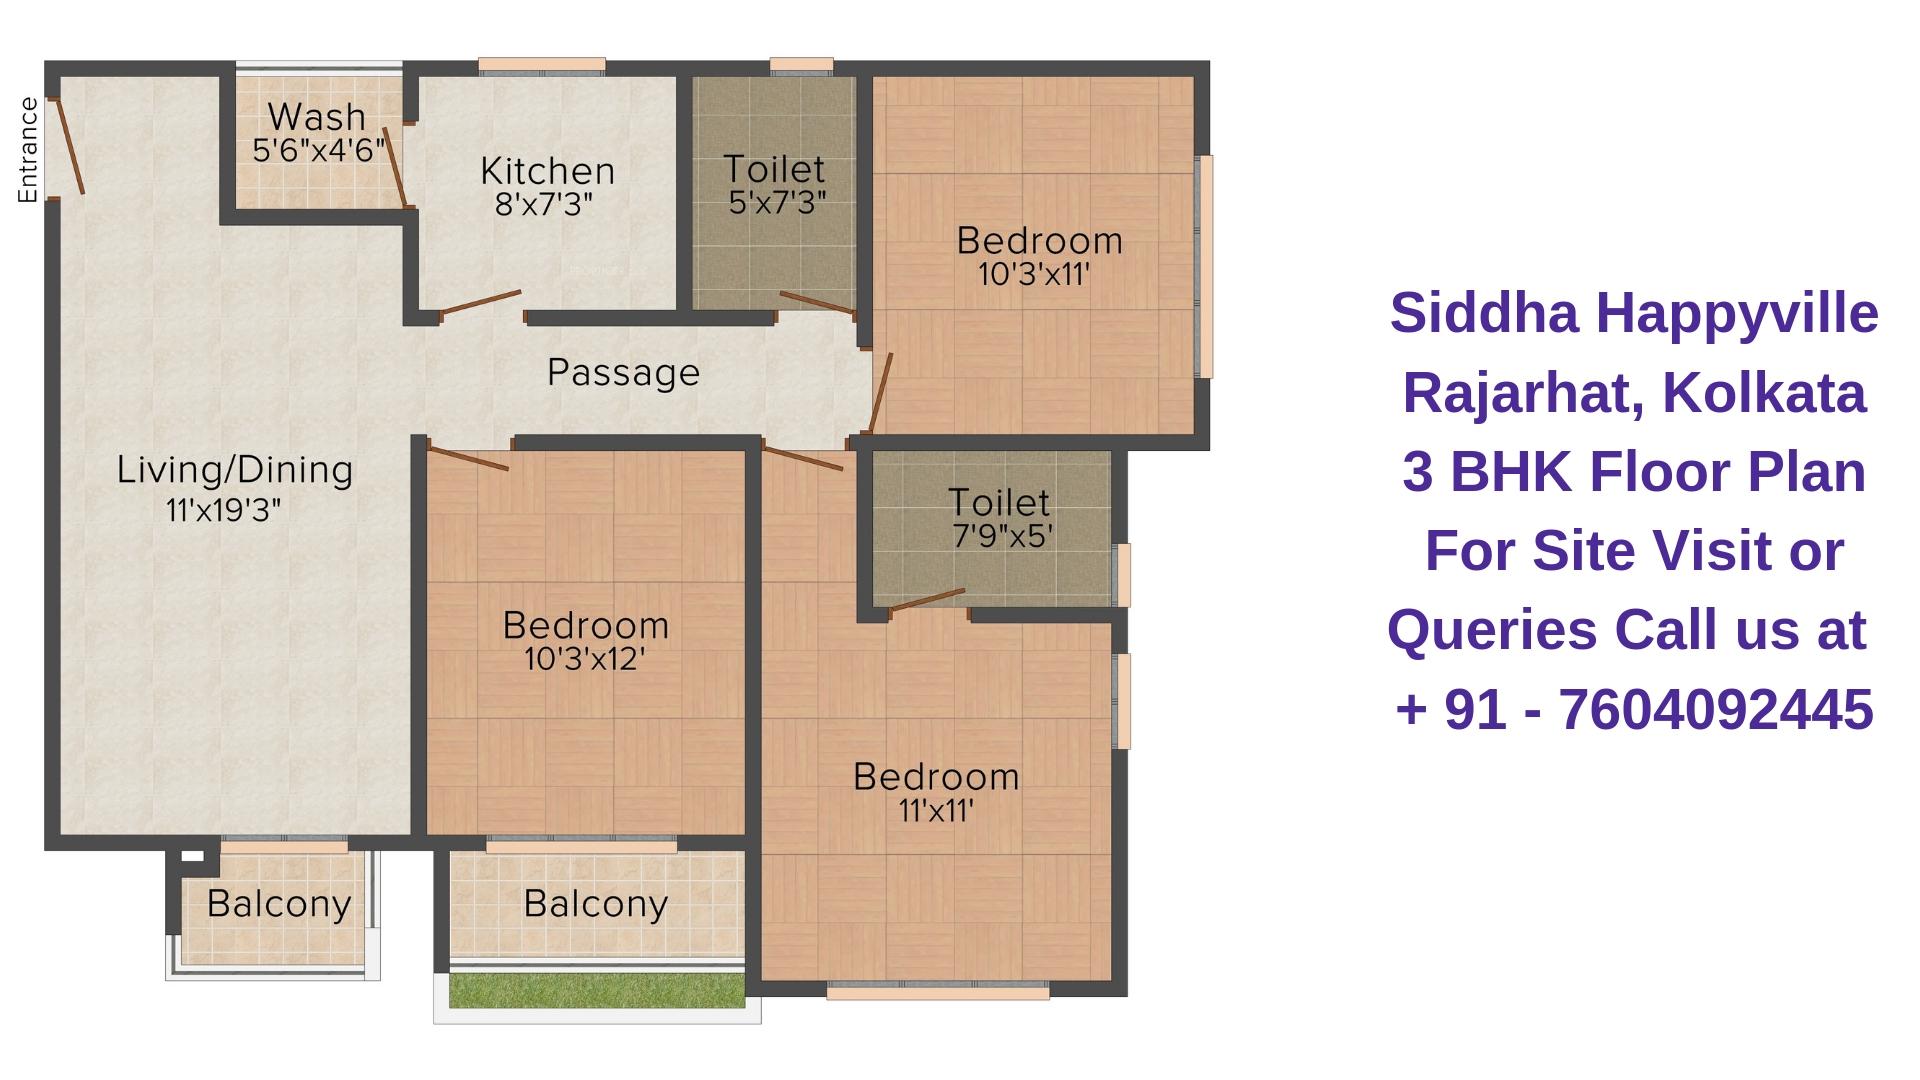 Siddha Happyville Rajarhat, Kolkata 3 BHK Floor Plan